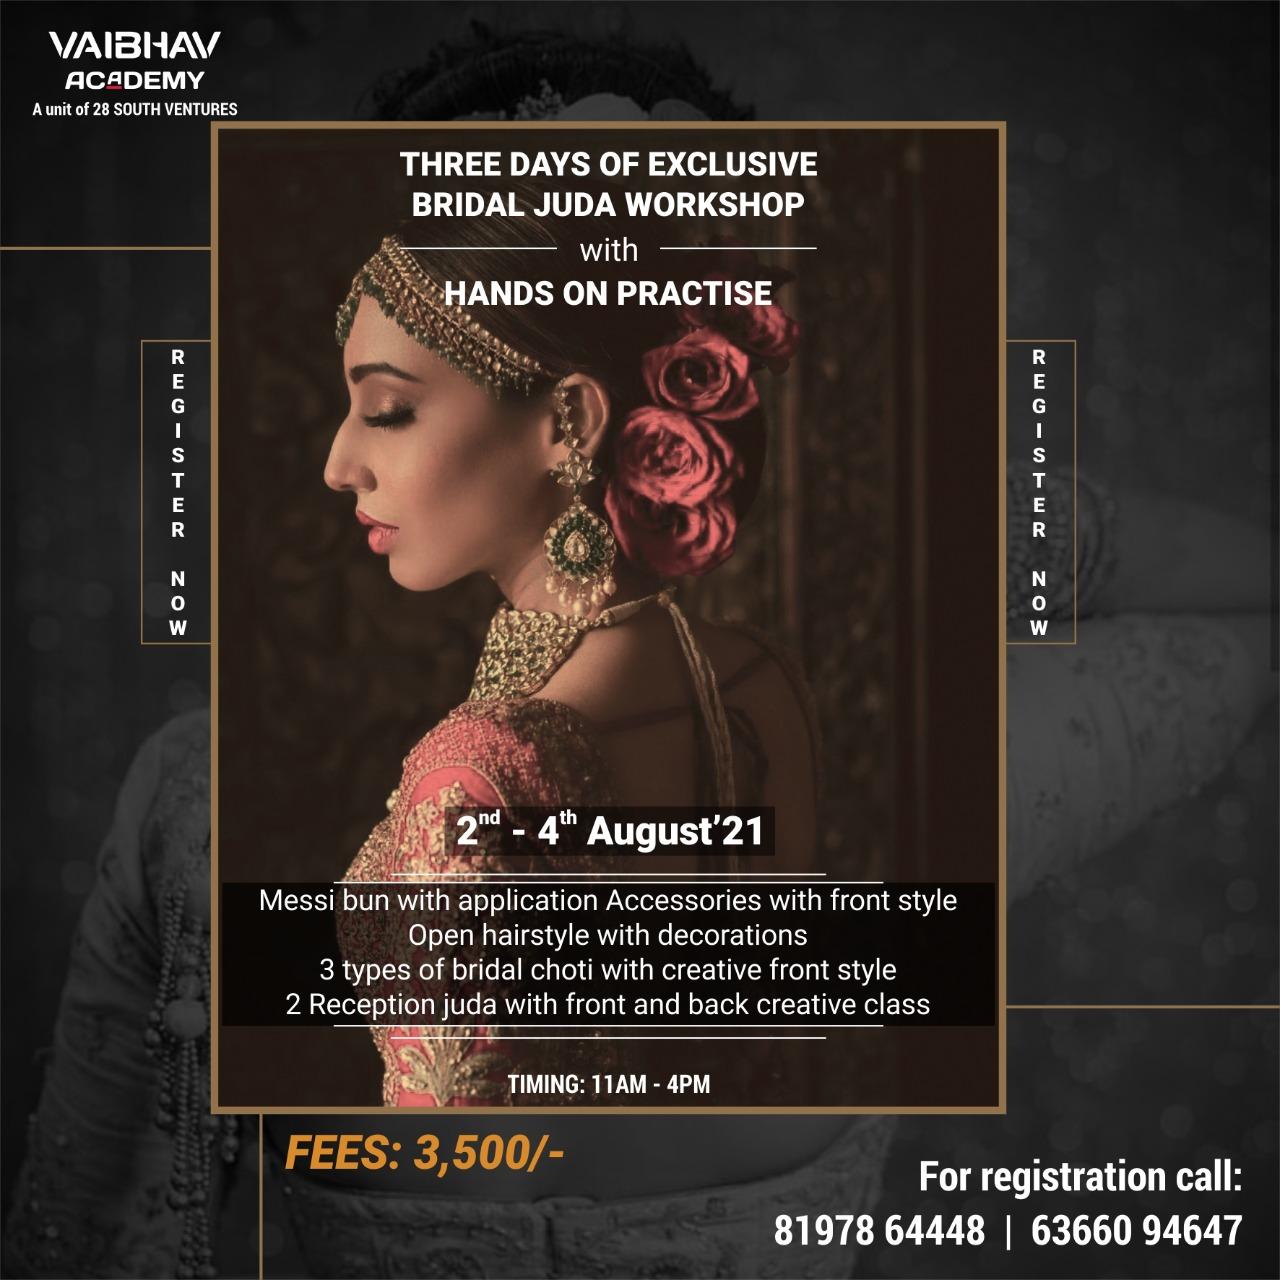 Vaibhav Group - 28 South Ventures